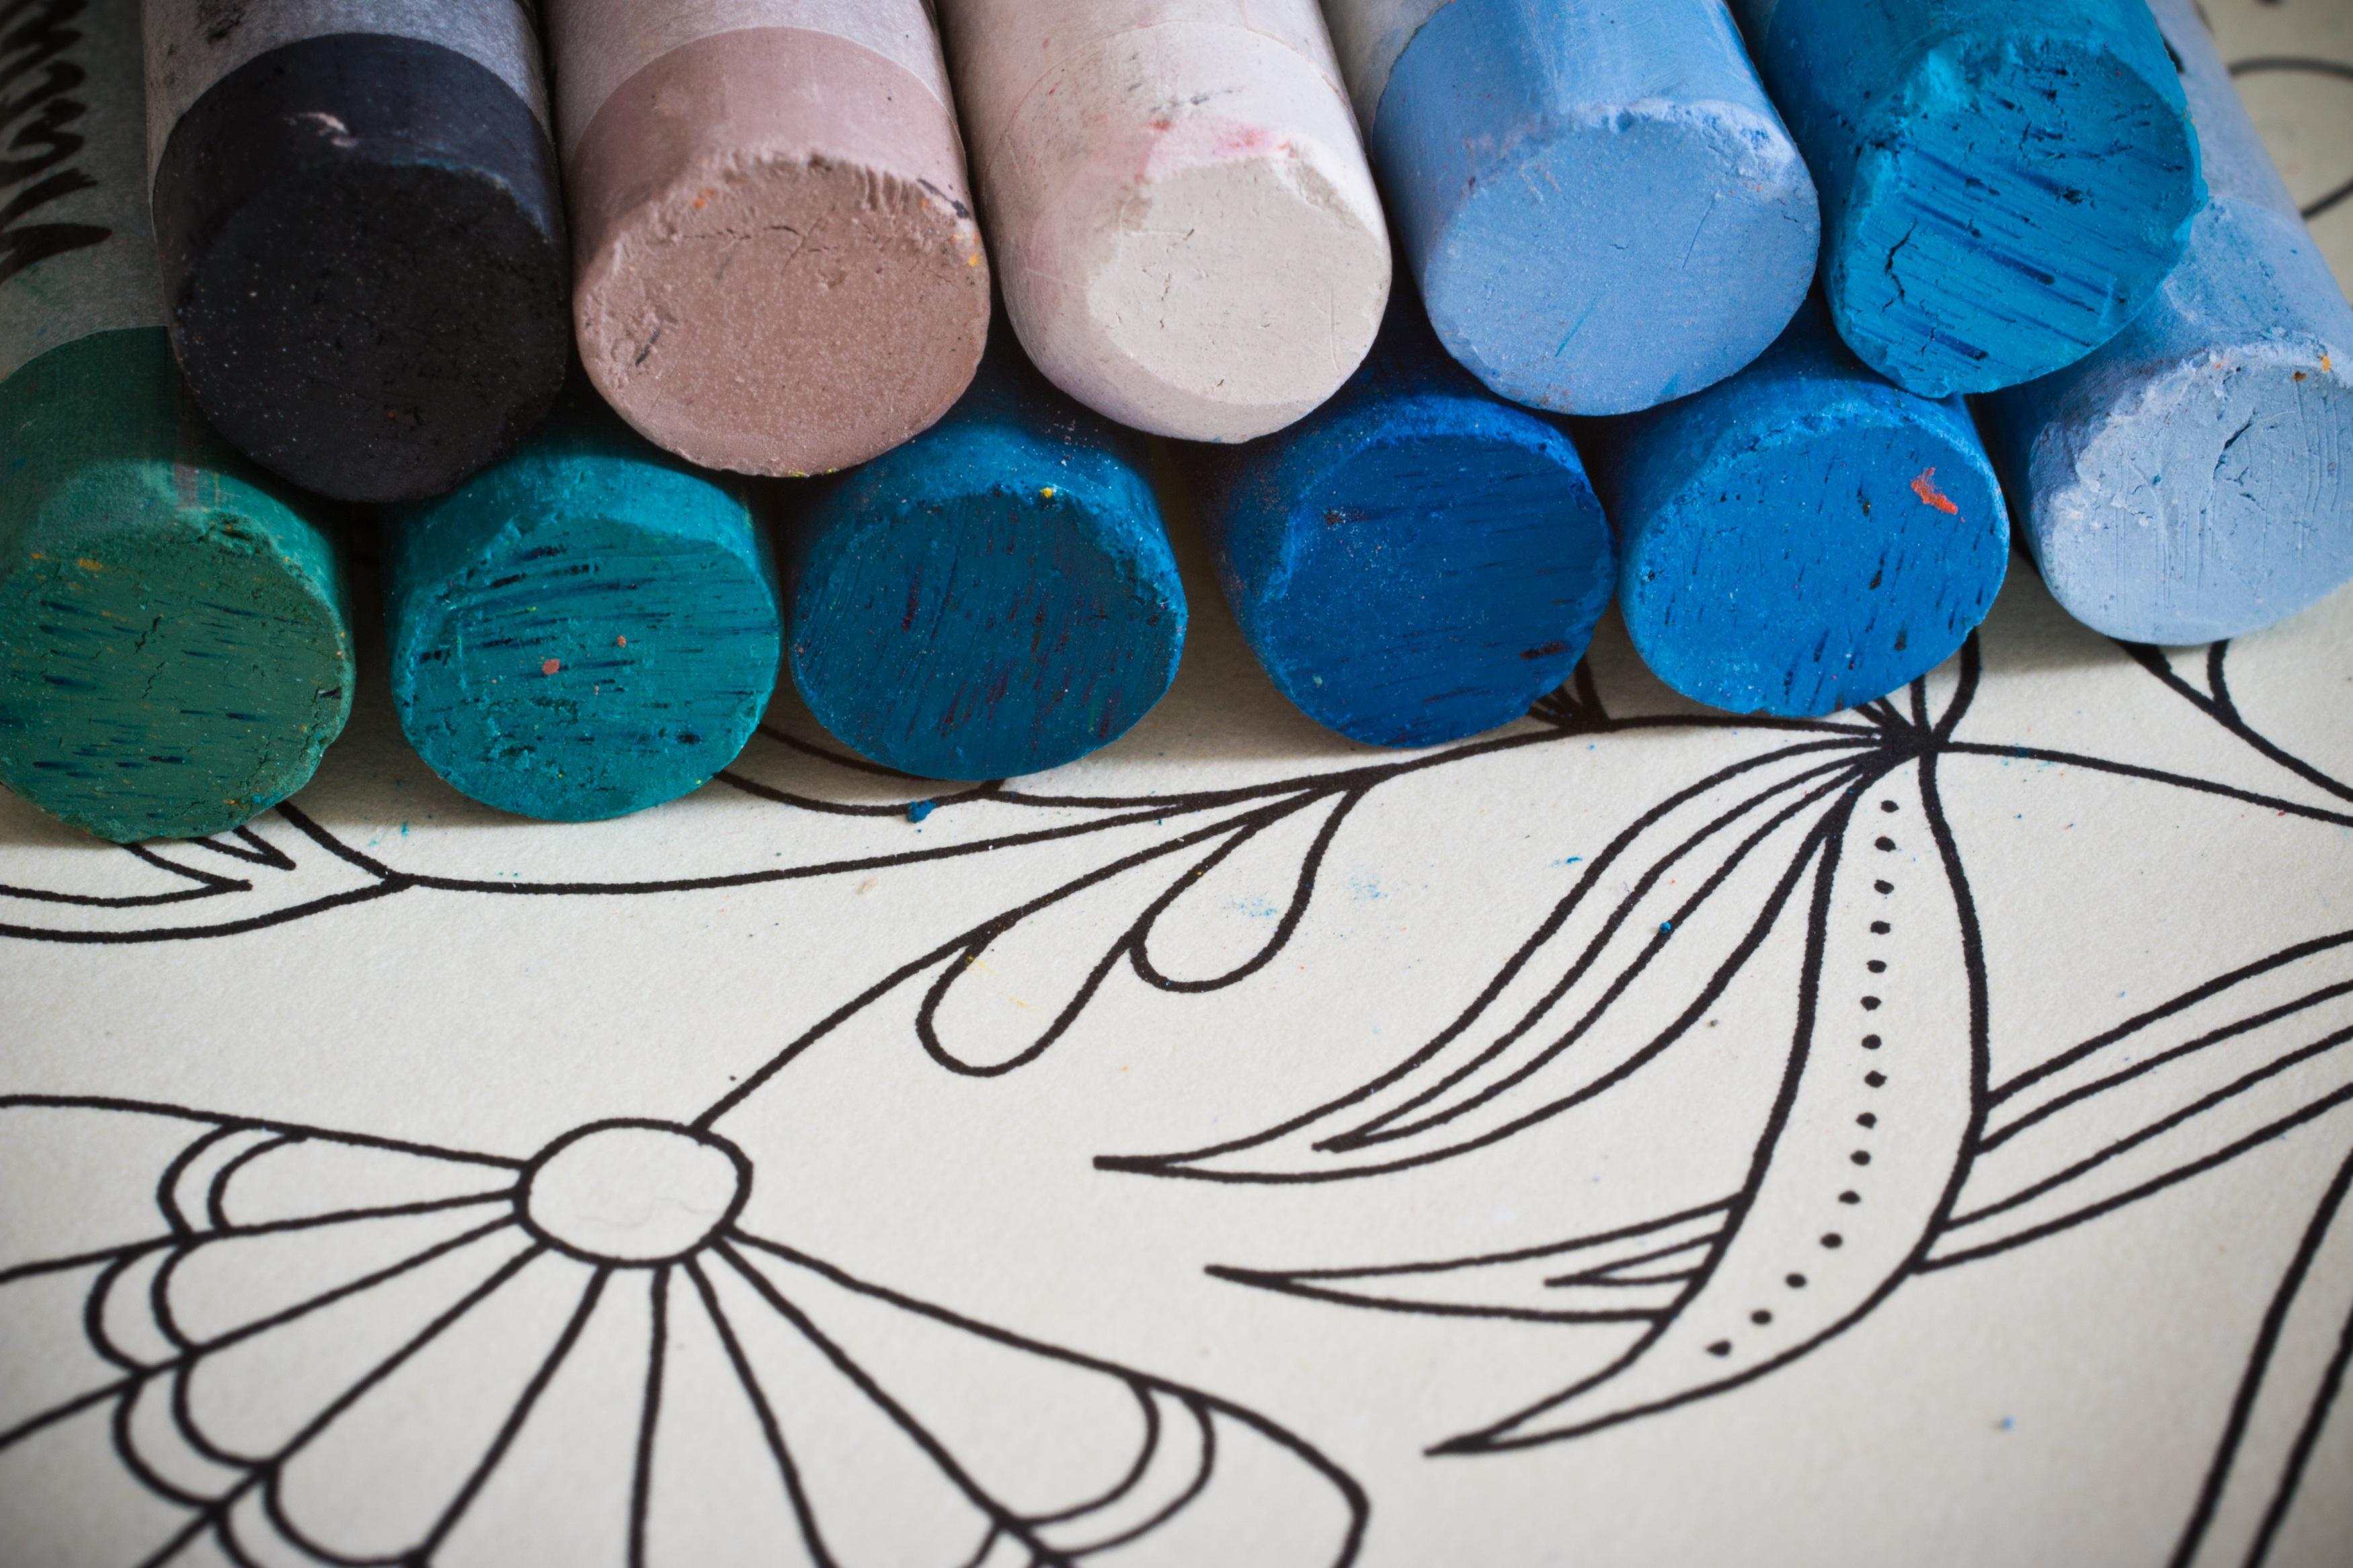 Immagini Belle Da Dipingere immagini belle : creativo, colore, dipingere, blu, materiale